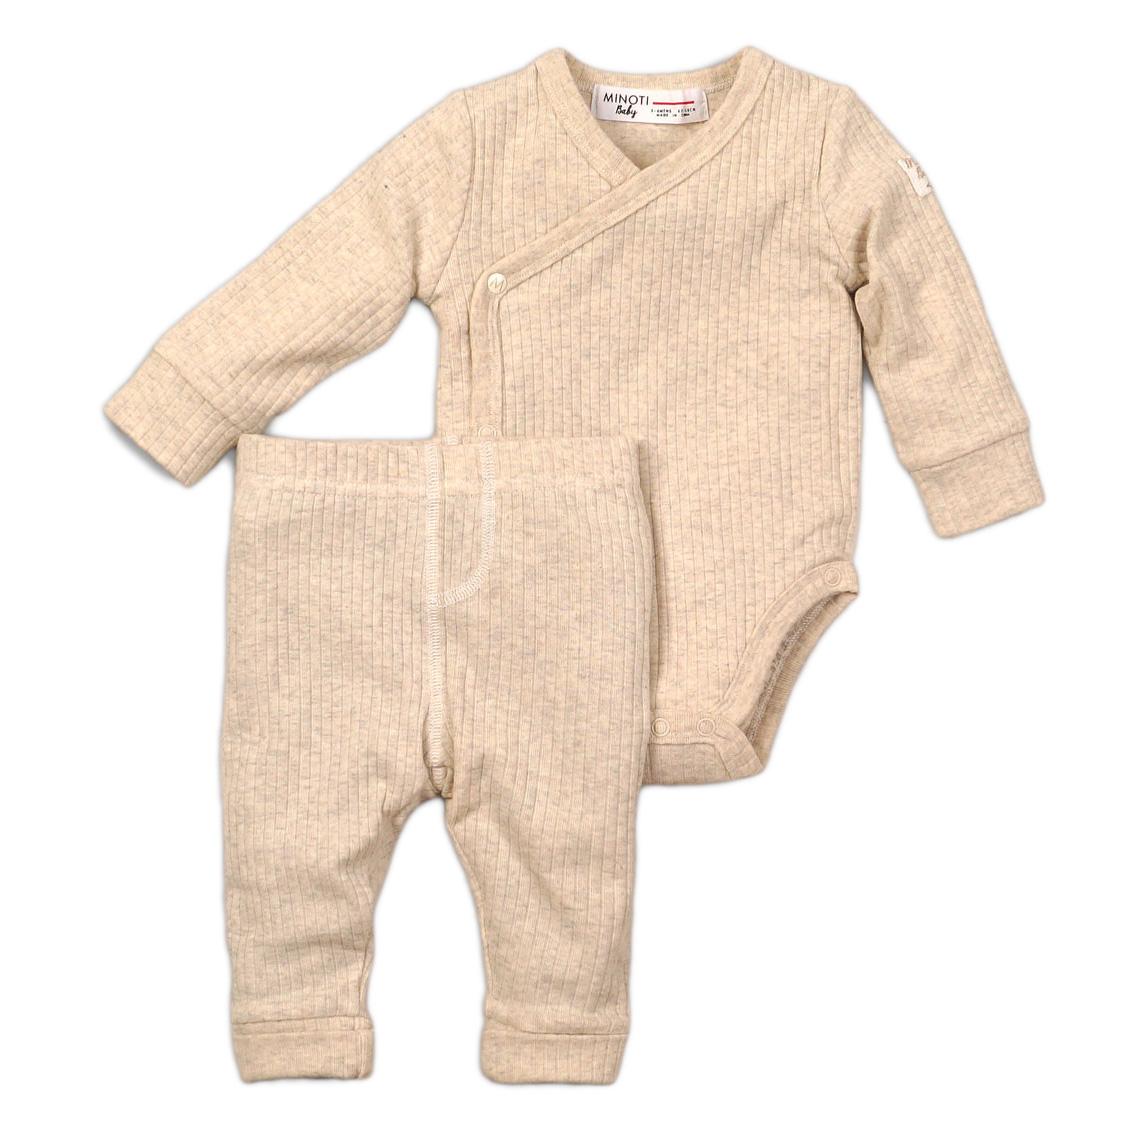 Setjes Babykleding.Baby Setje Spruitjesfabriek